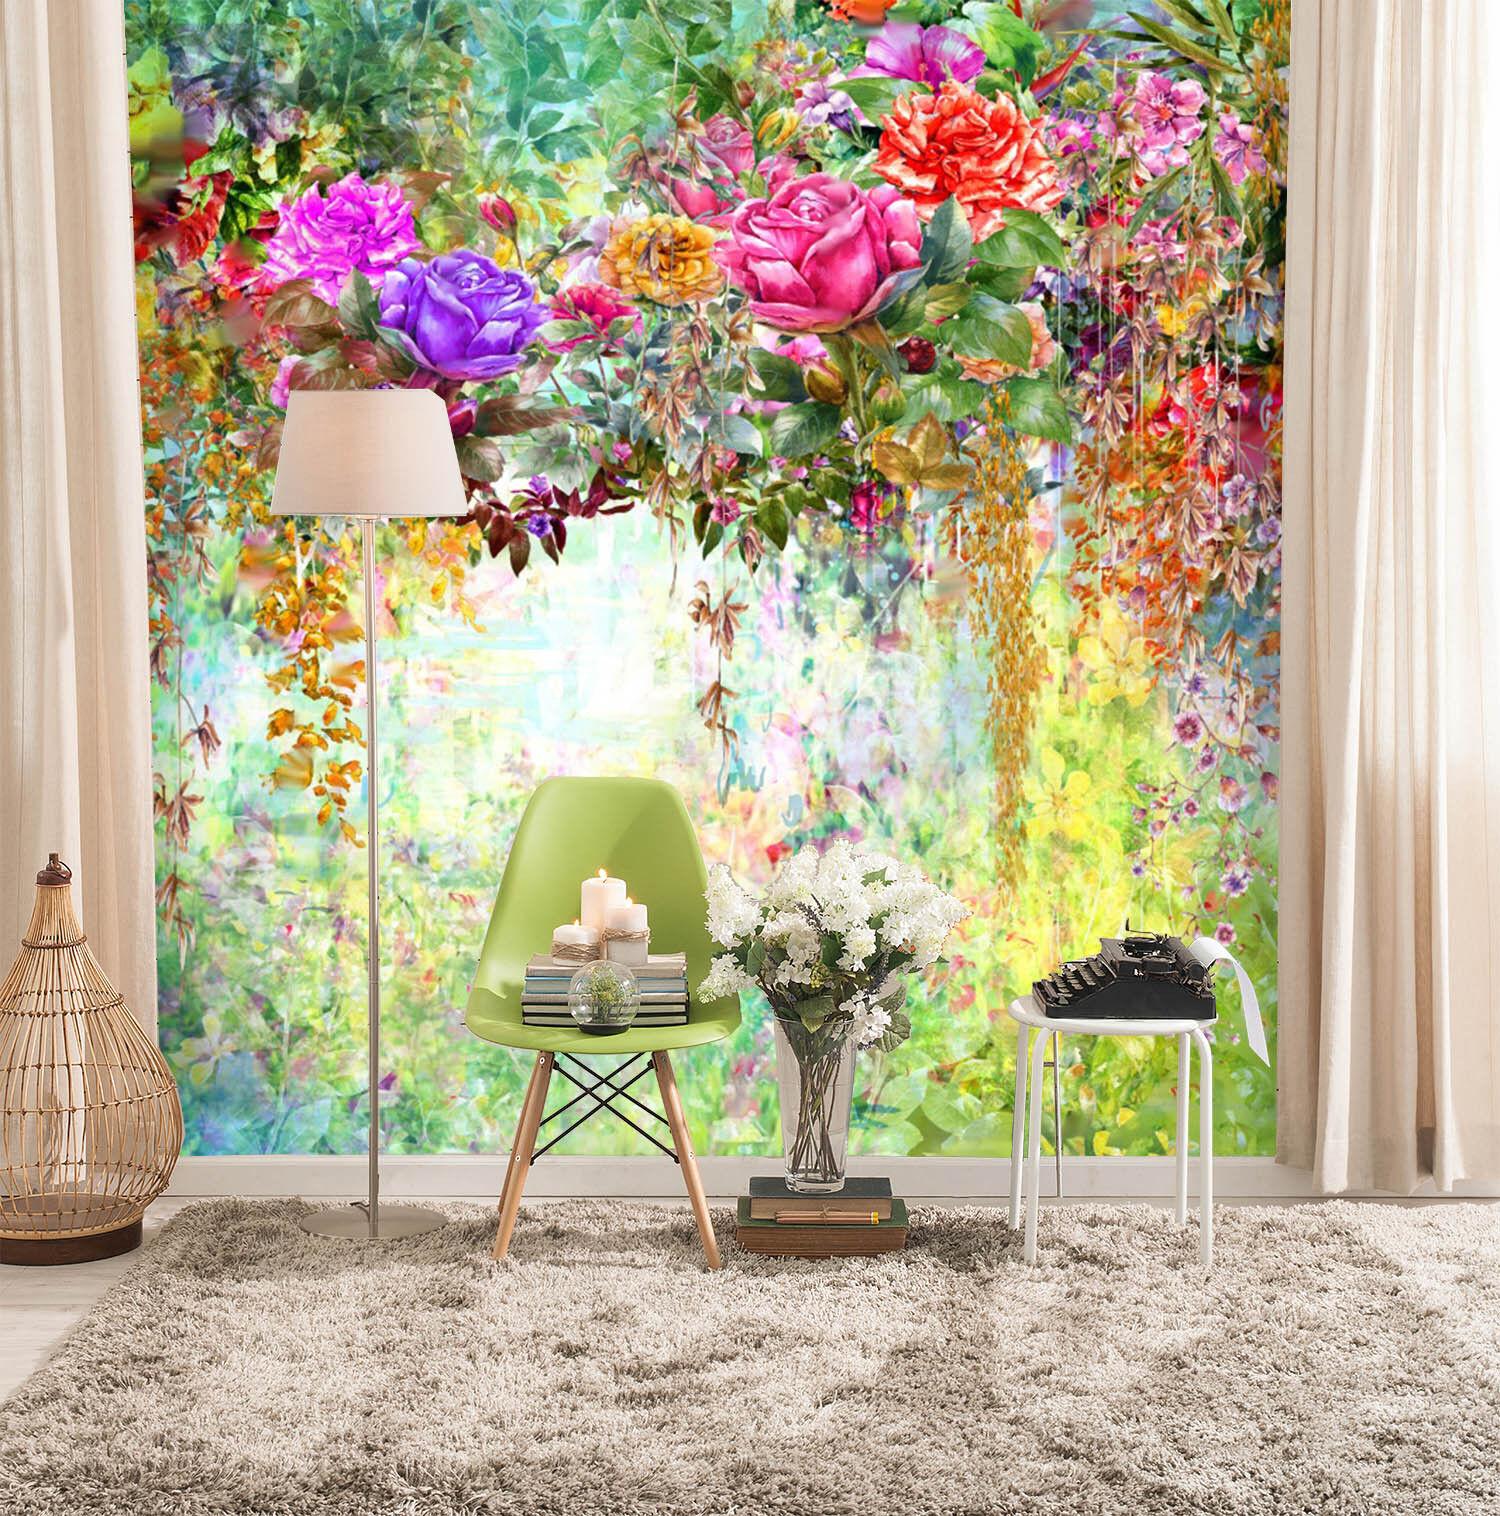 3D Bunte Blumen 411 Fototapeten Wandbild Fototapete Bild Tapete Familie Kinder